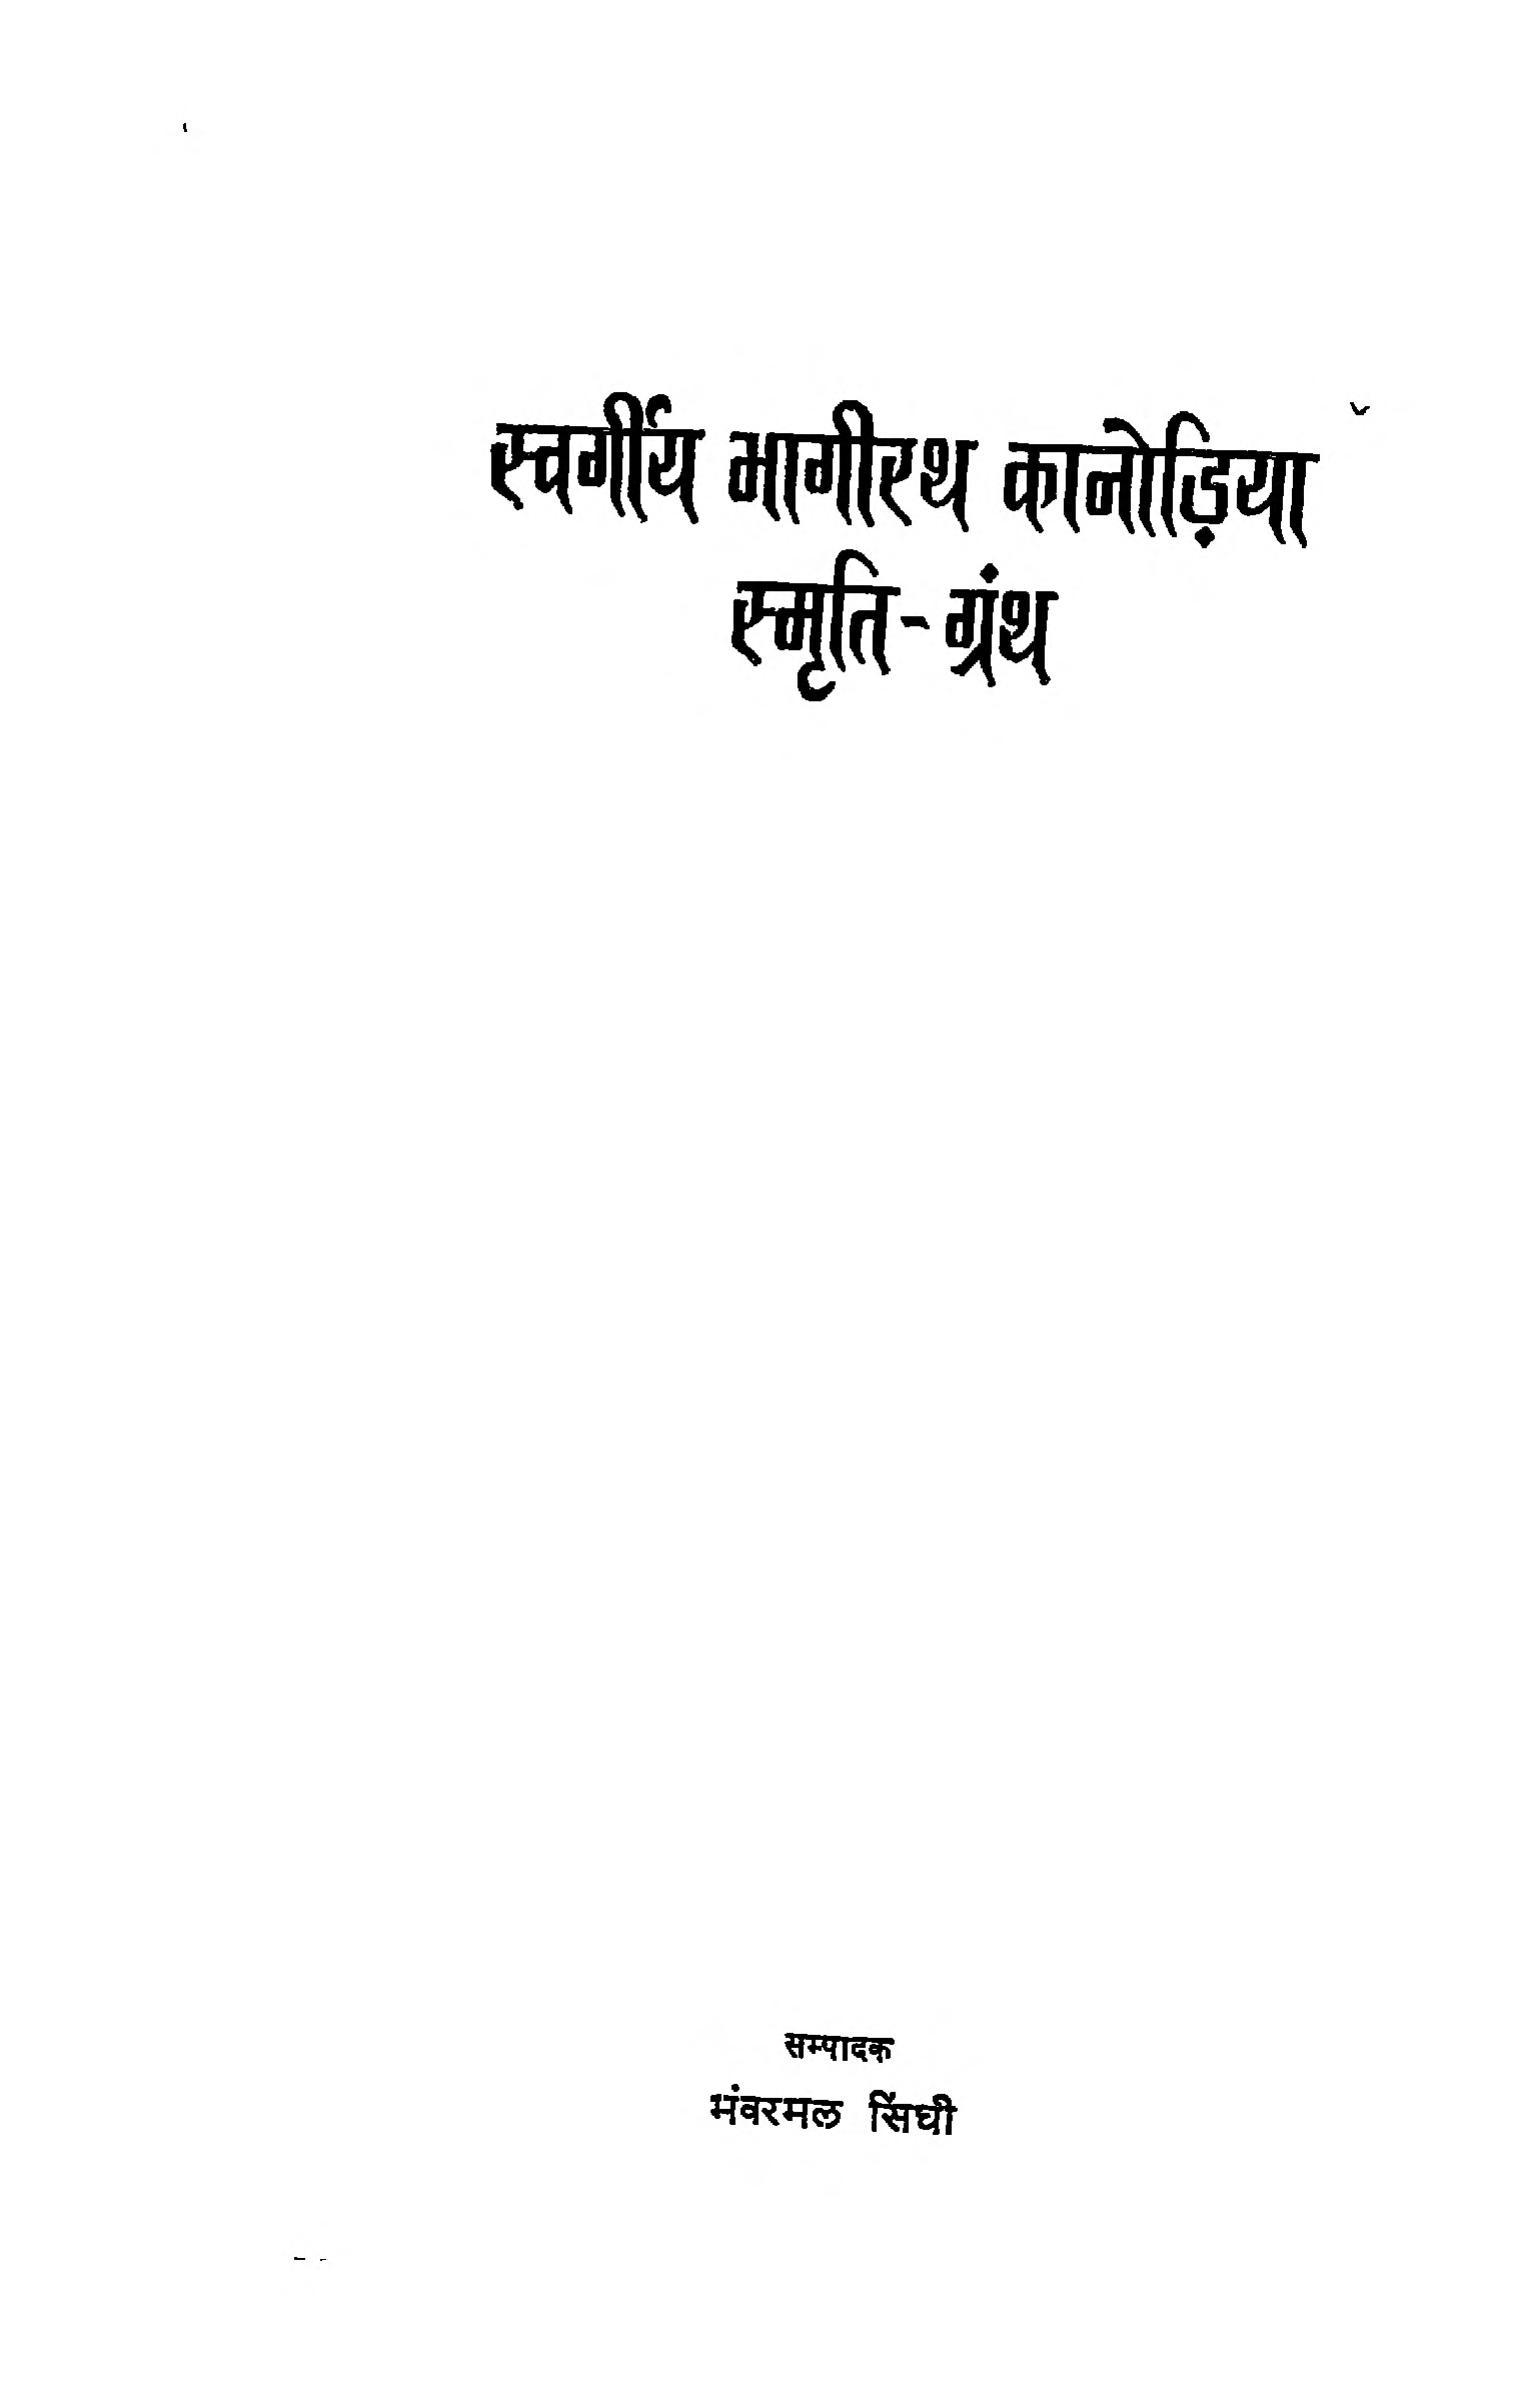 Book Image : स्वर्गीय भागीरथ कनोड़िया स्मृति-ग्रंथ  - Swargiya Bhagirath Kanodiya Smrty Granth